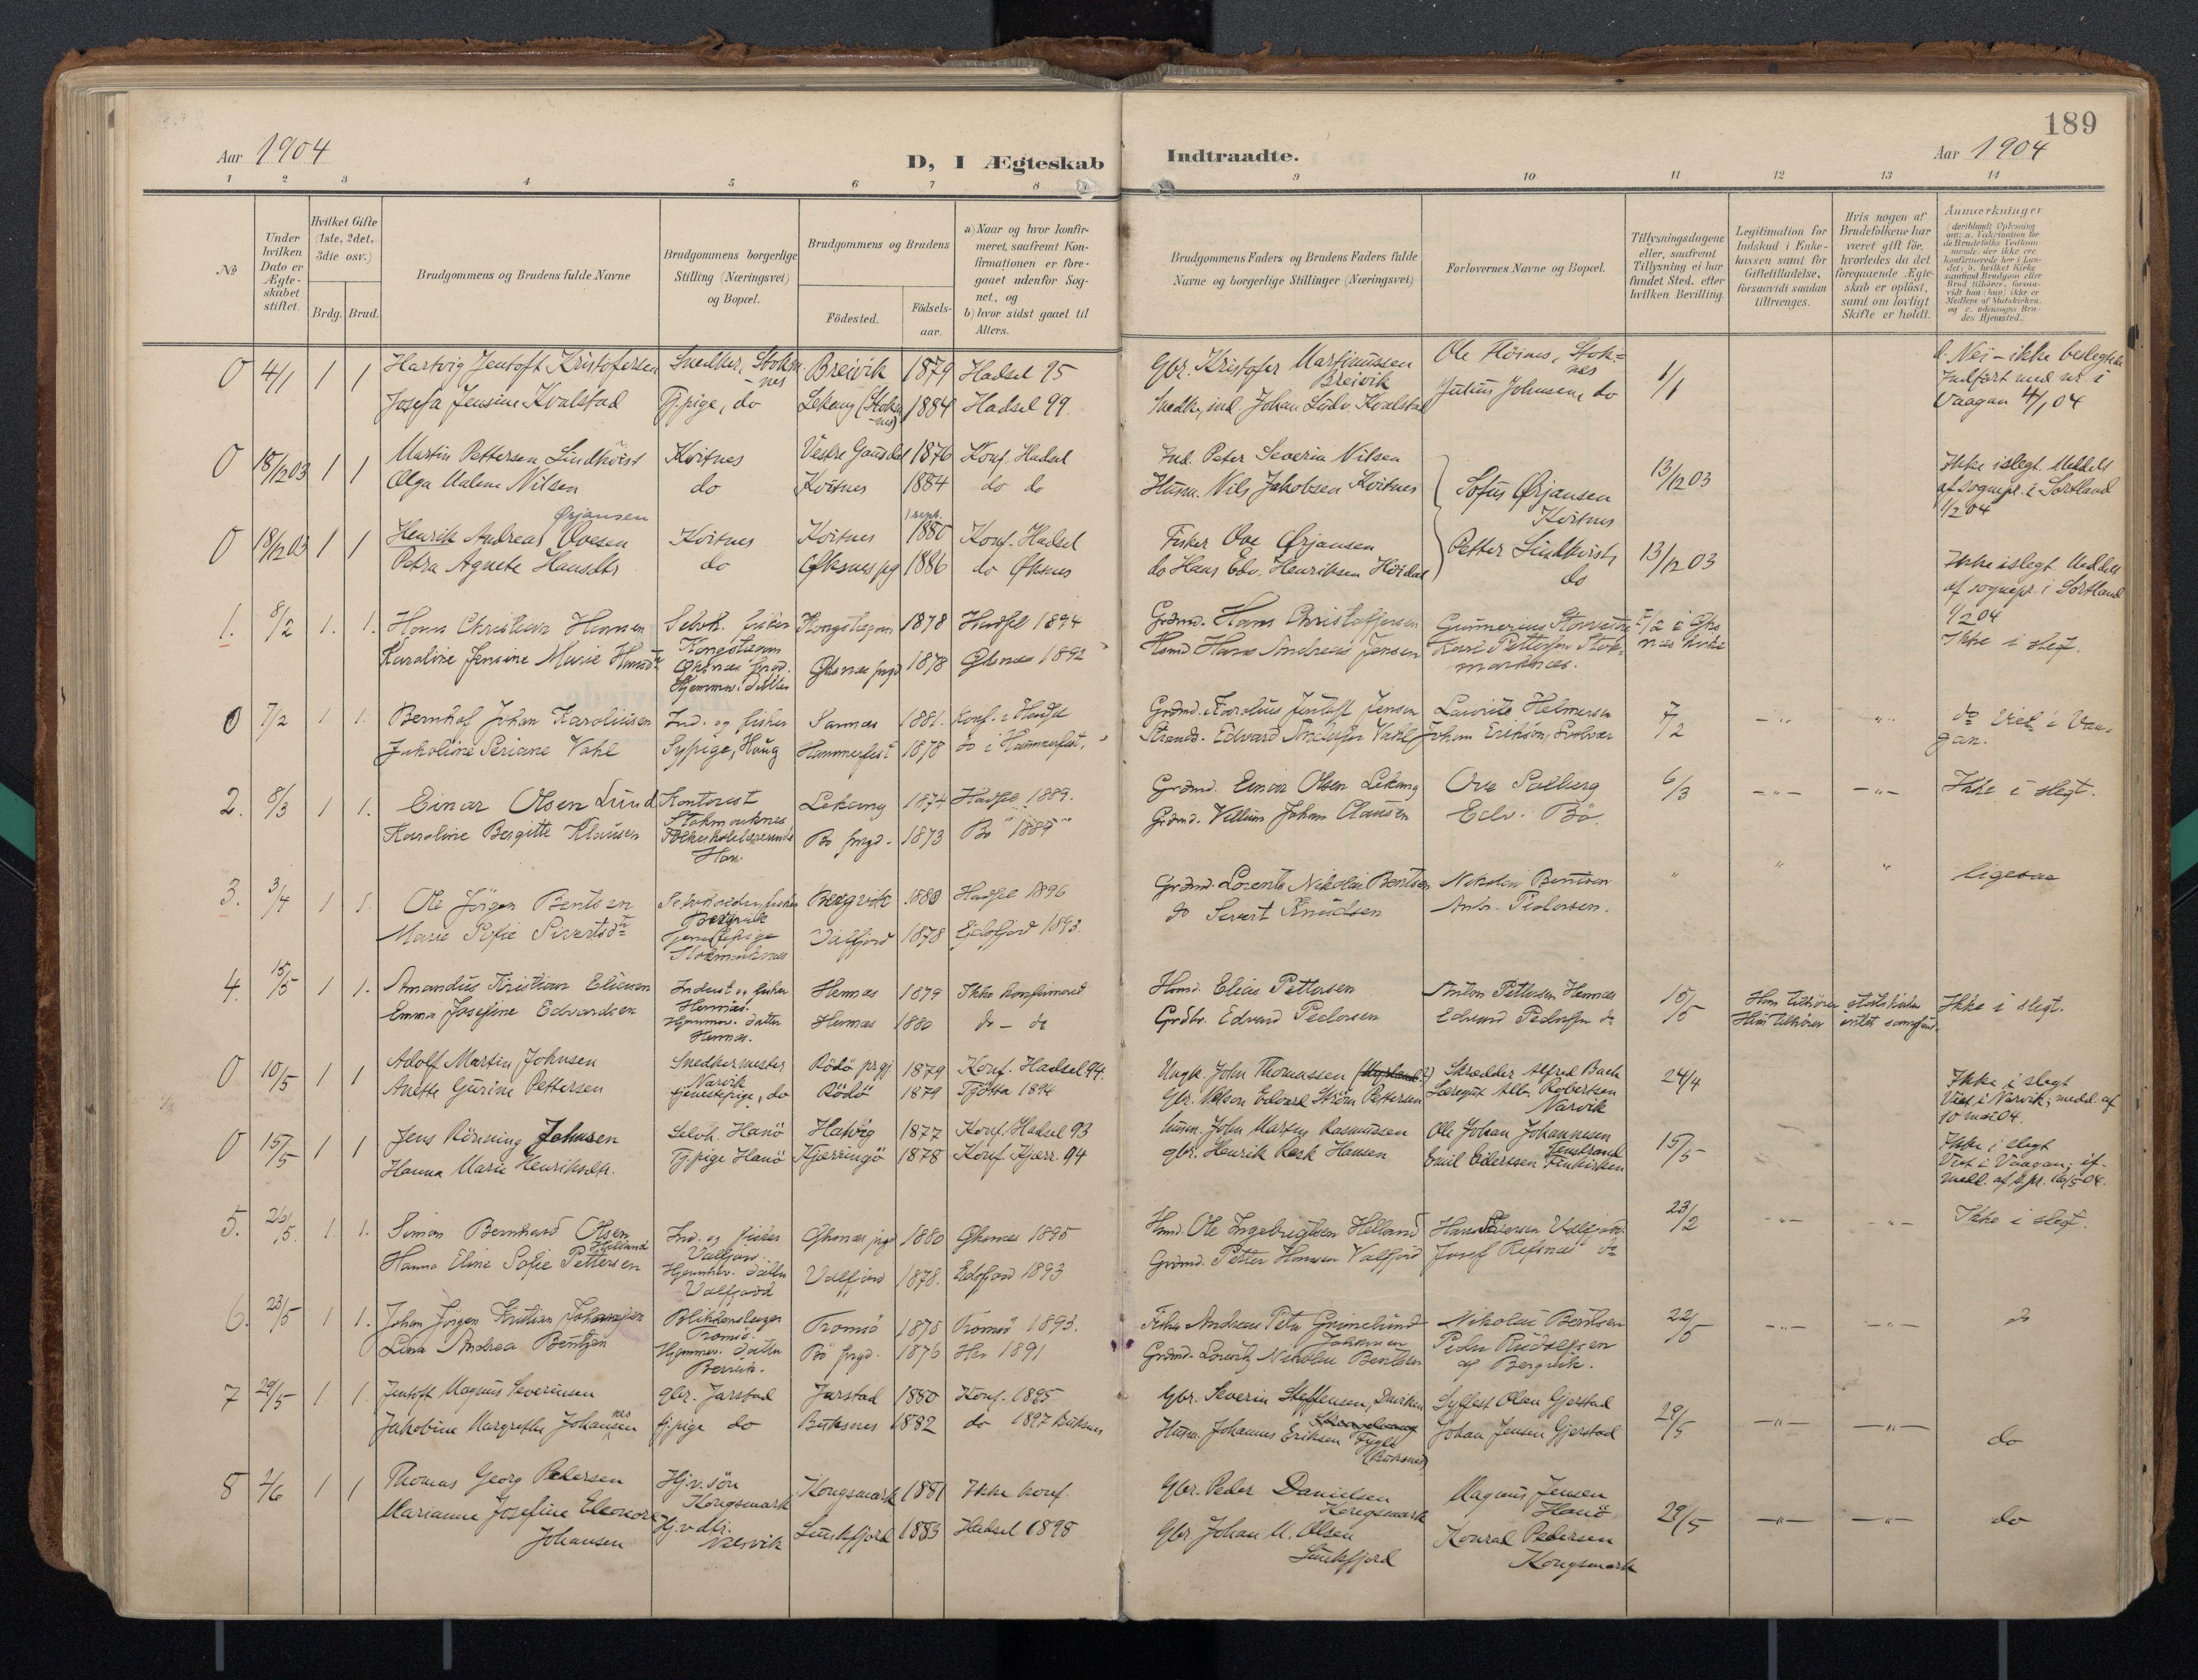 SAT, Ministerialprotokoller, klokkerbøker og fødselsregistre - Nordland, 888/L1248: Ministerialbok nr. 888A14, 1904-1913, s. 189